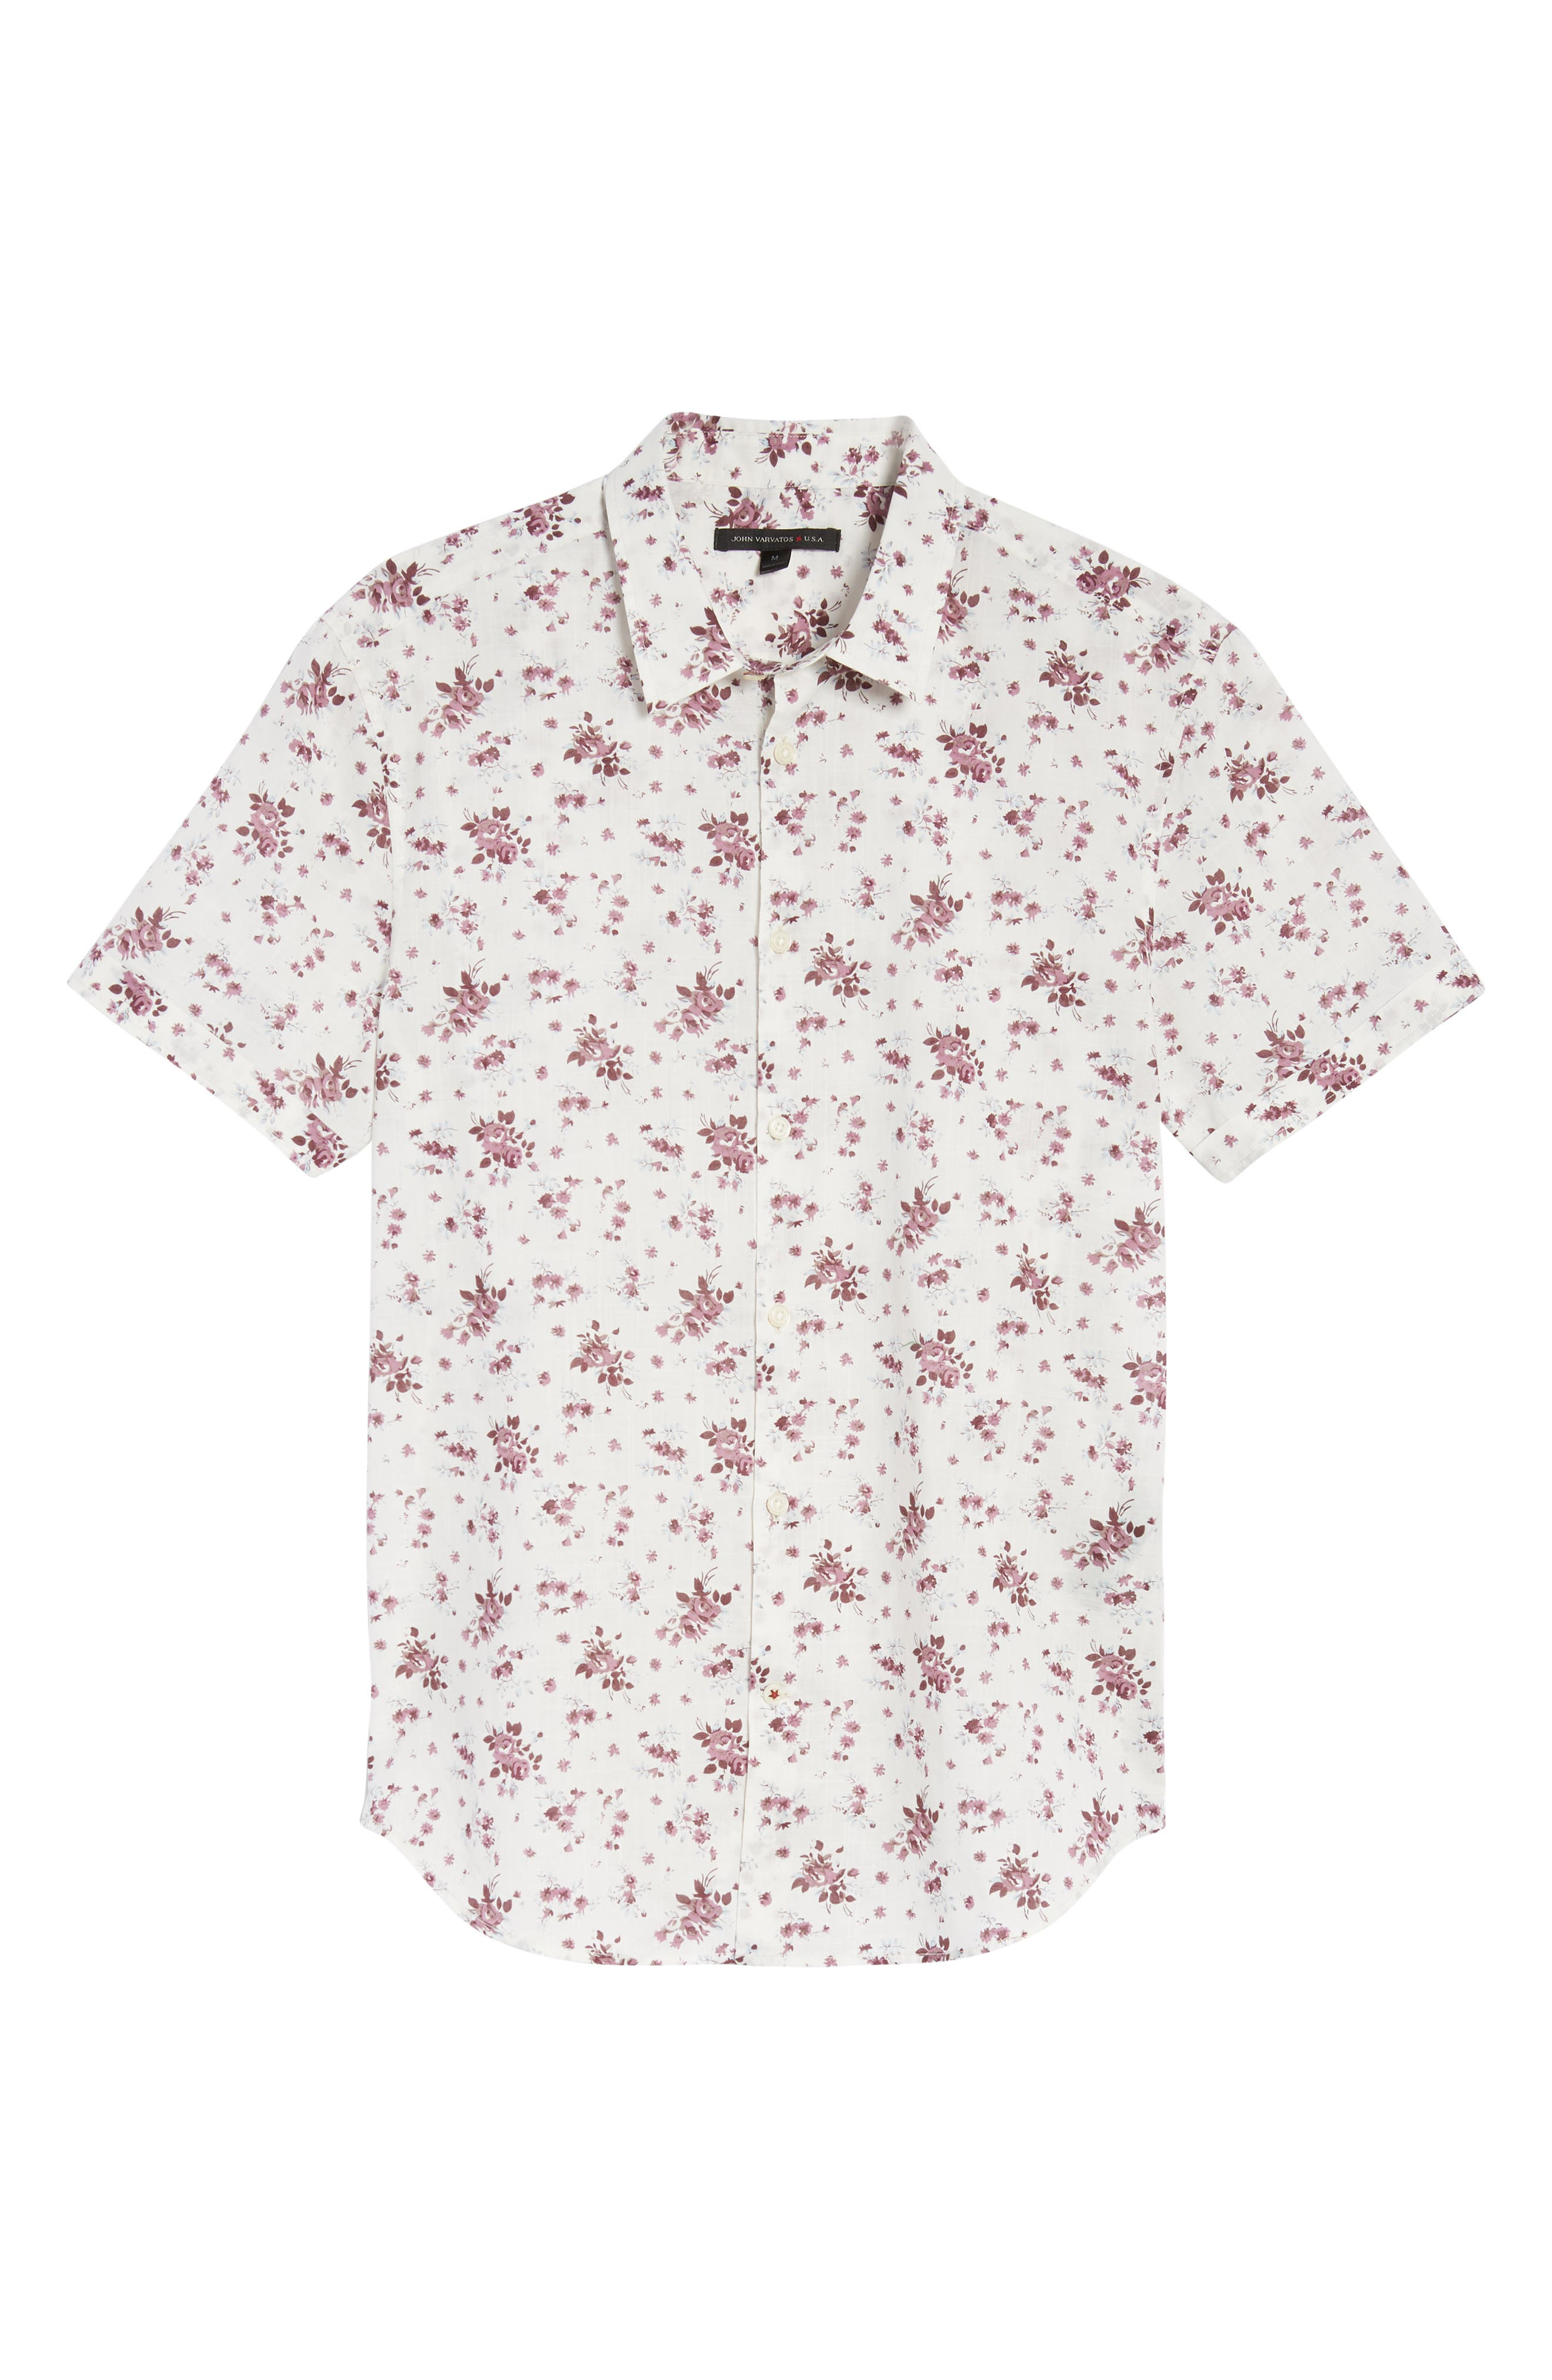 Regular Fit Floral Woven Shirt,                             Alternate thumbnail 6, color,                             661